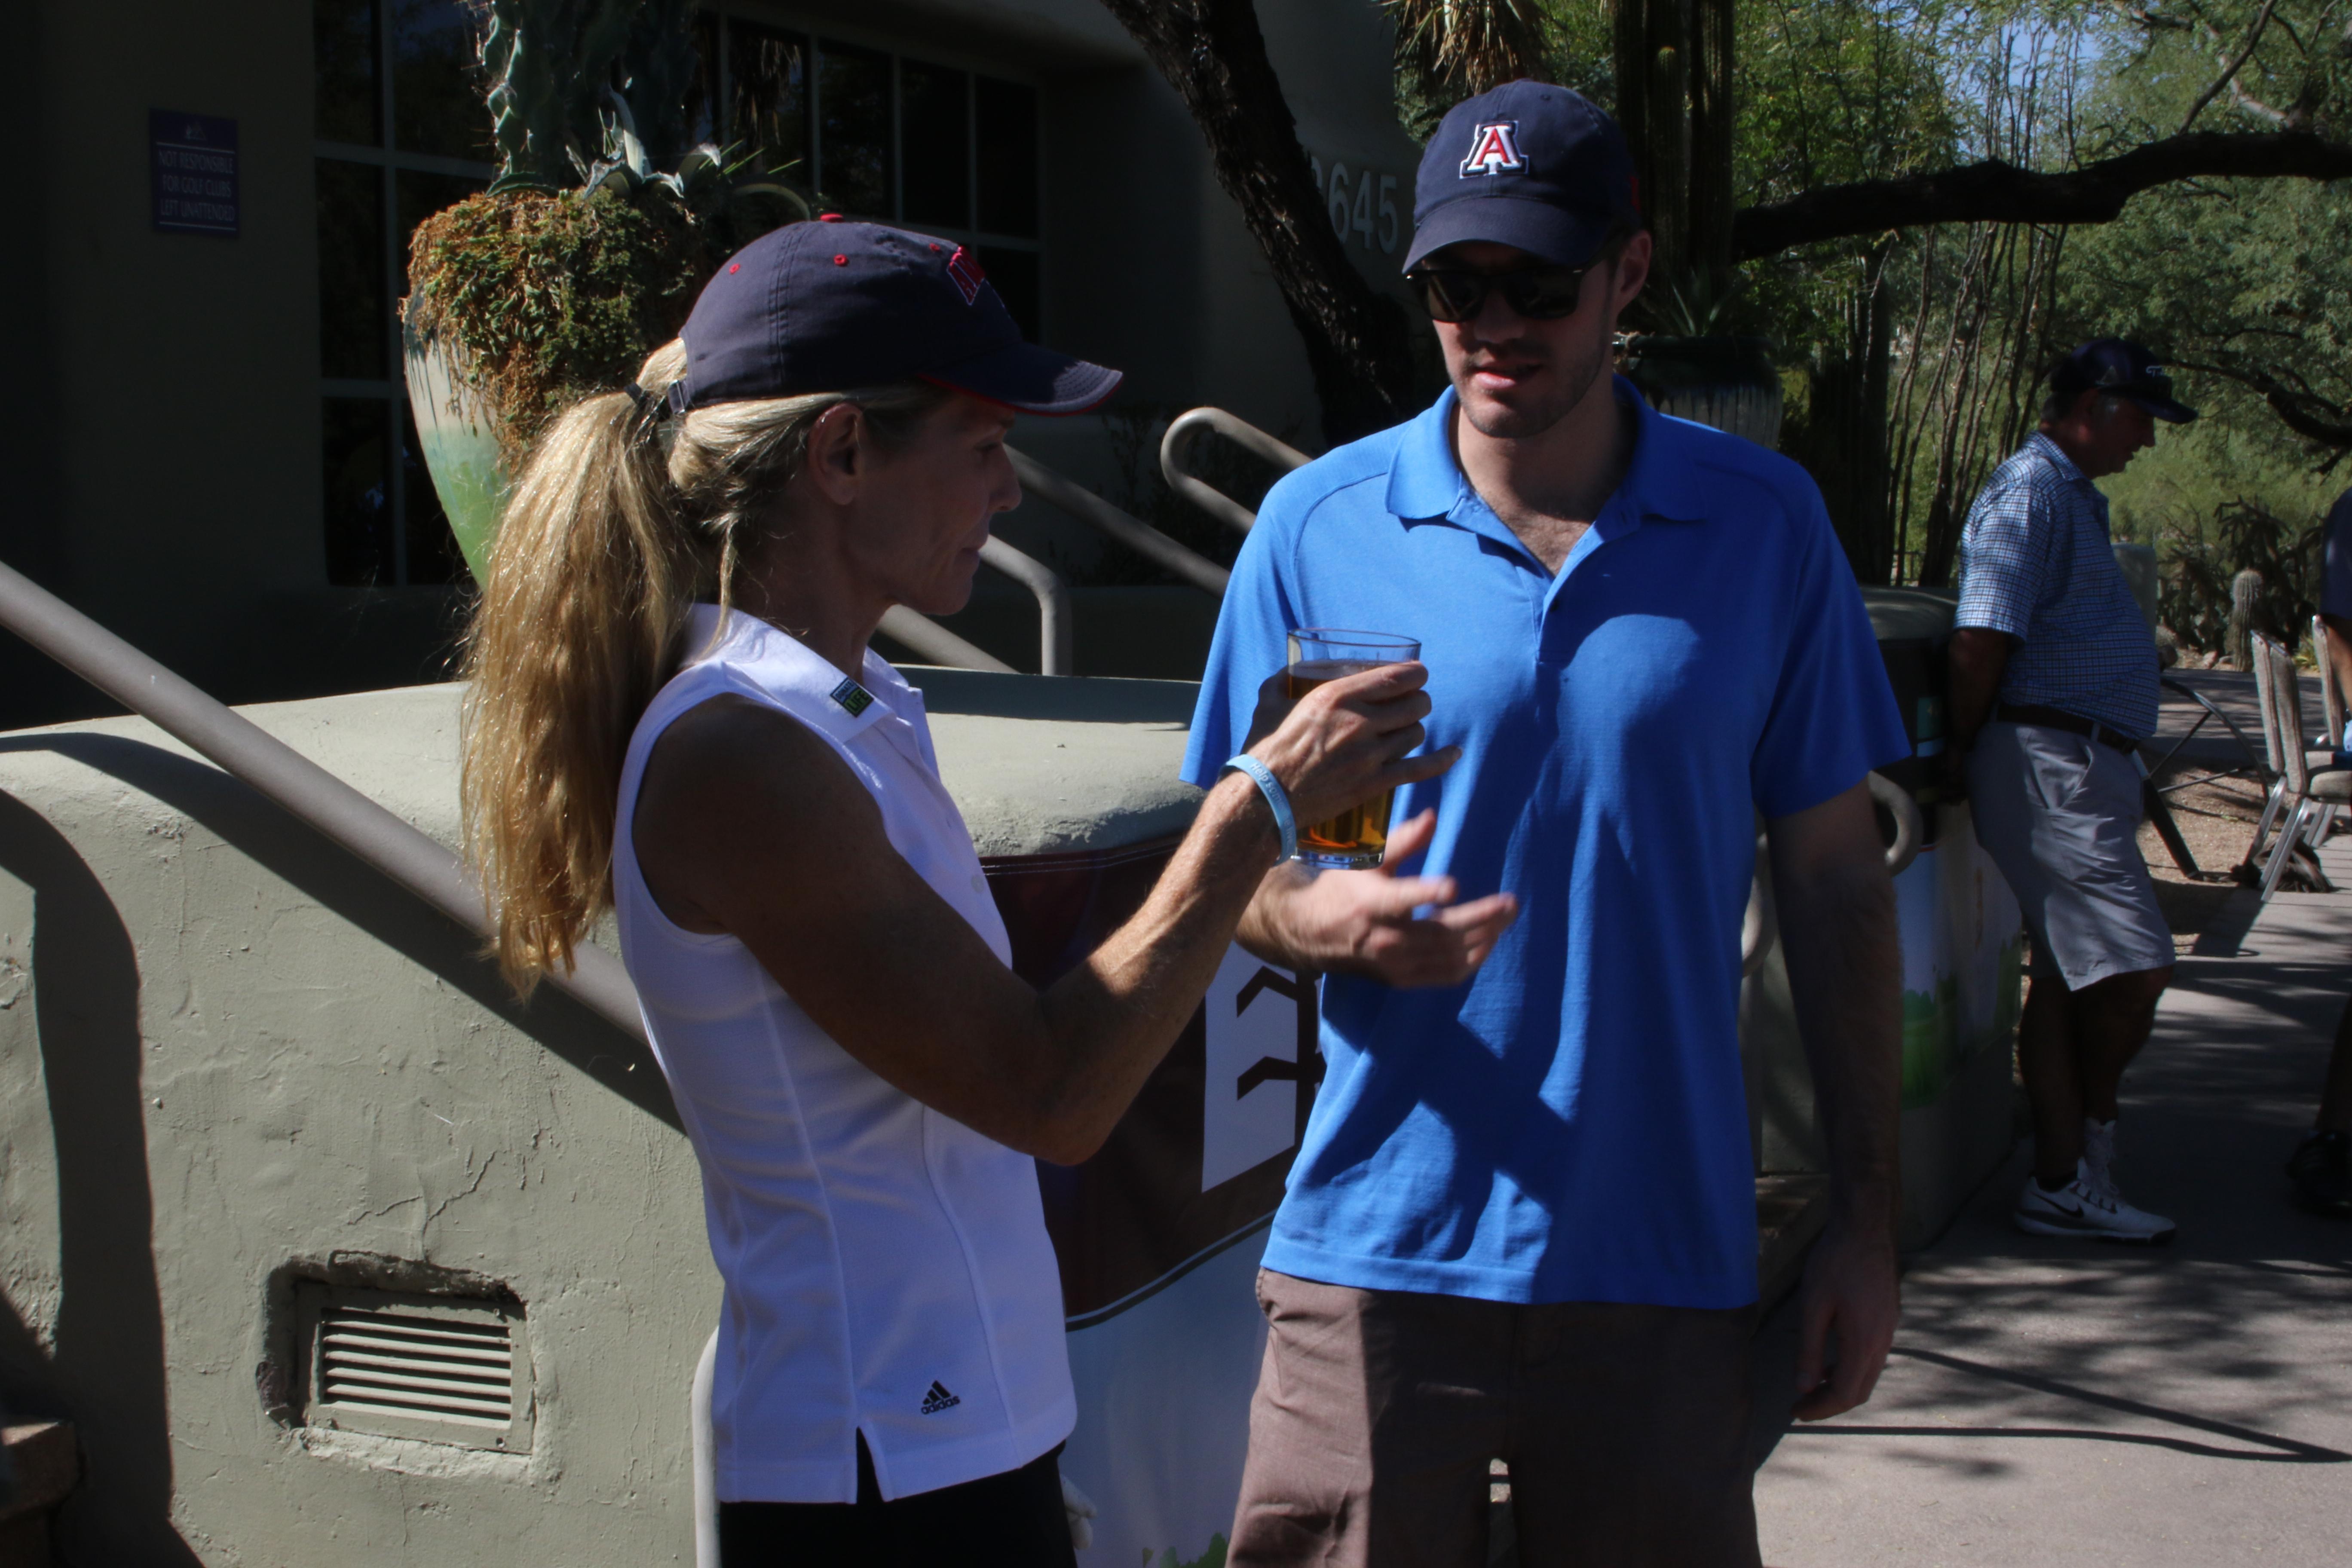 KA - Evan Spear Memorial Golf Tournament gallery image #7